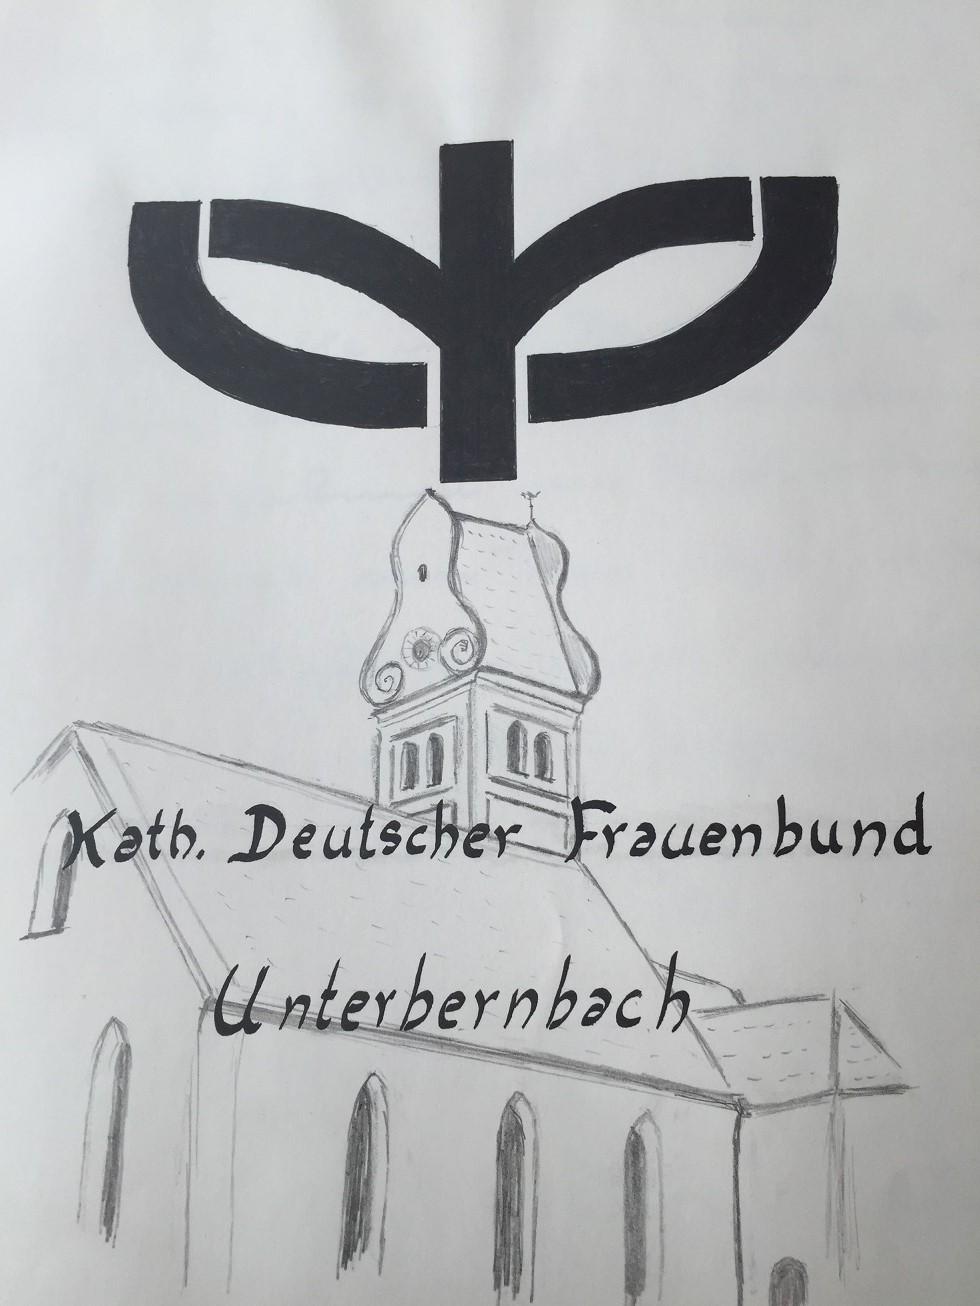 KDFB Unterbernbach